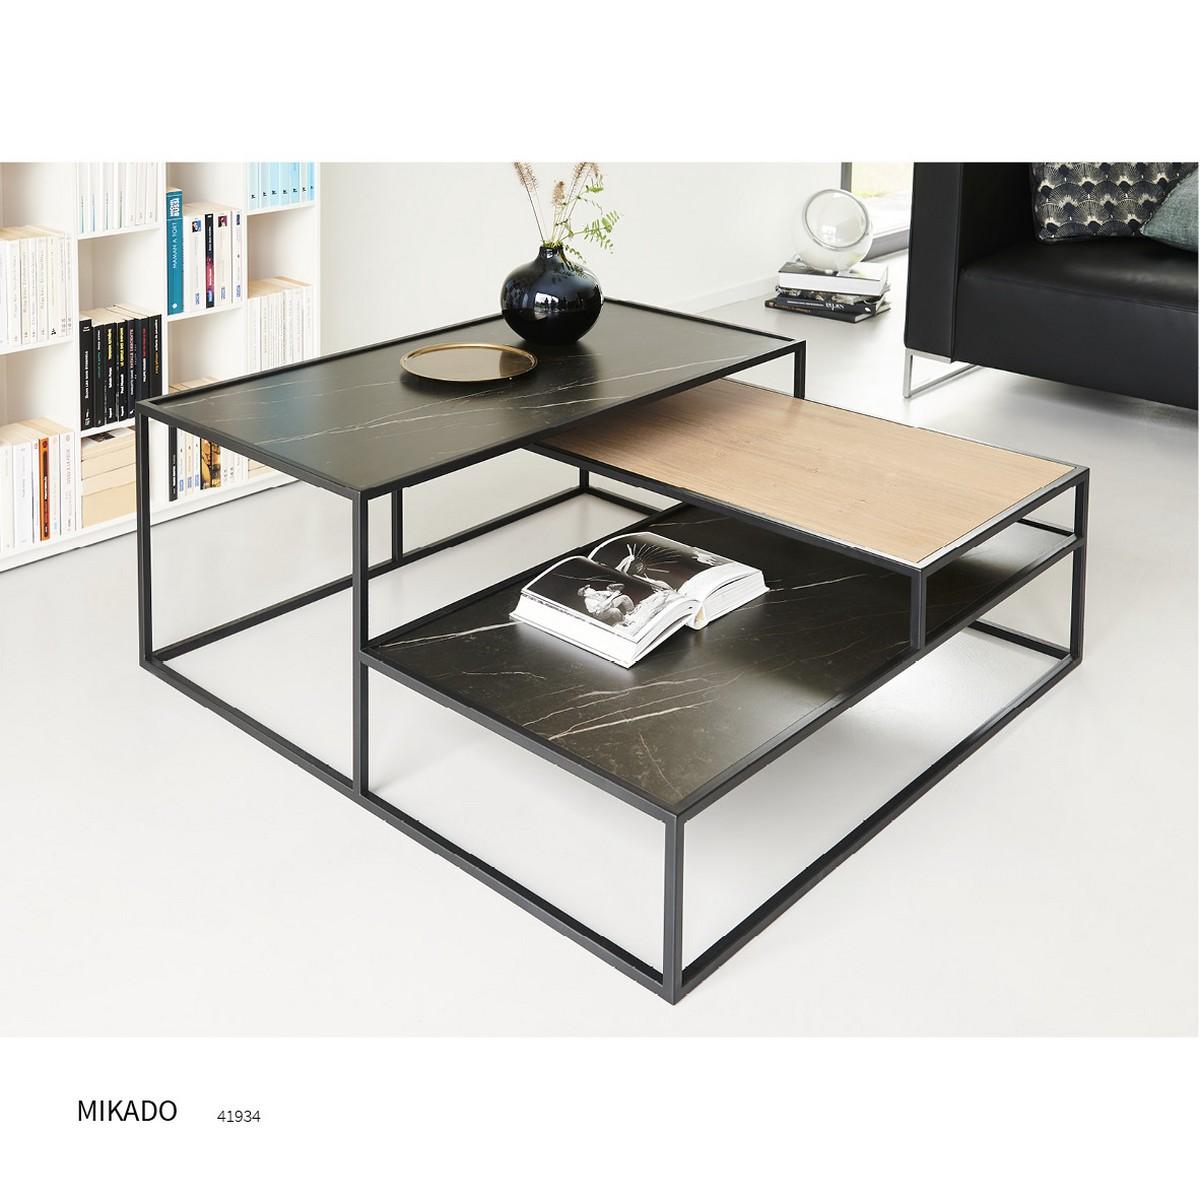 Table basse MIKADO